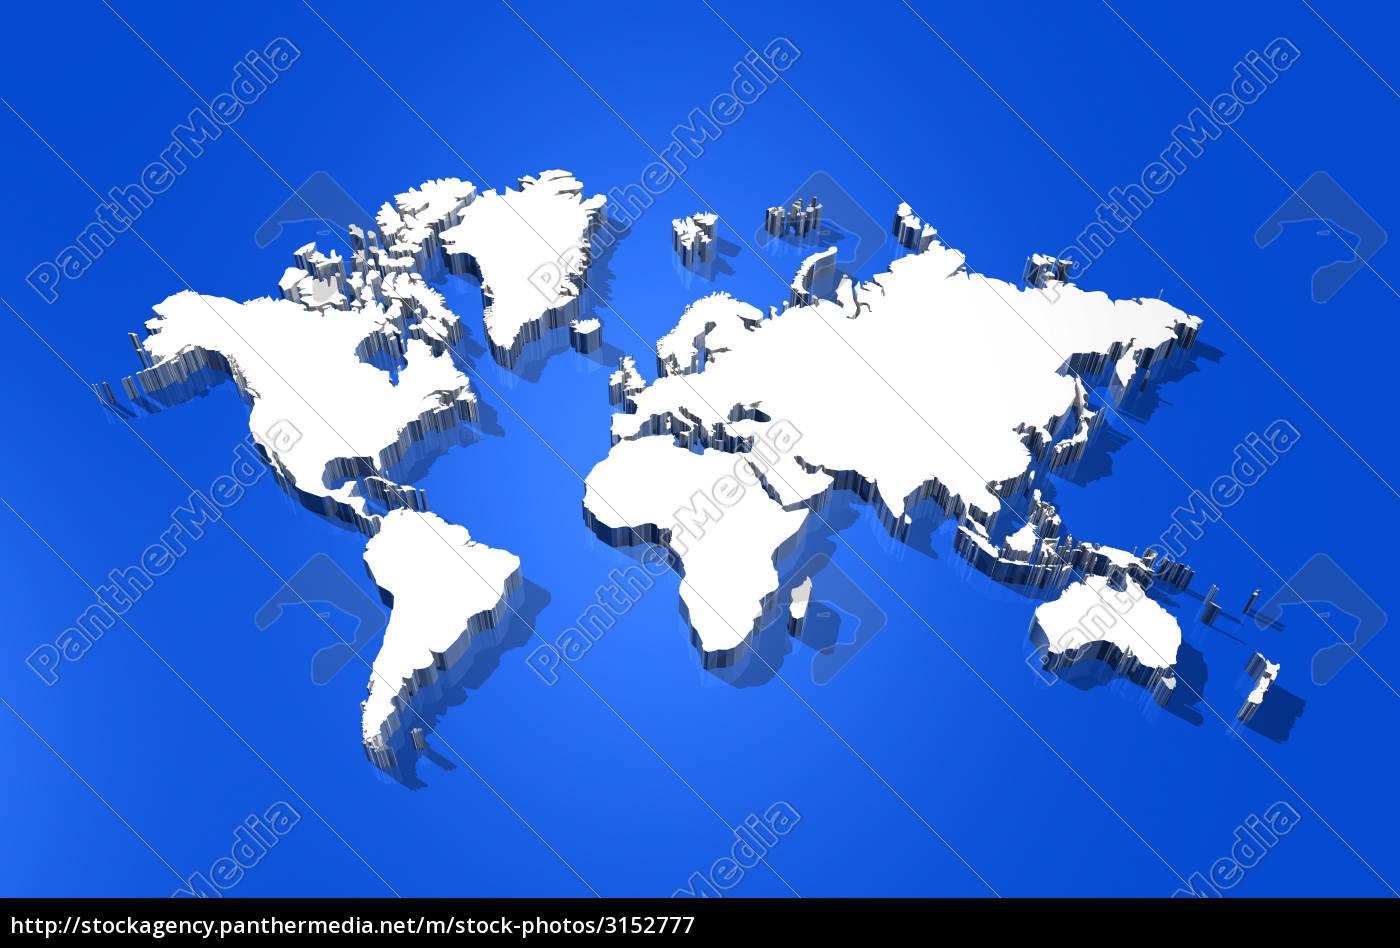 world, map - 3152777